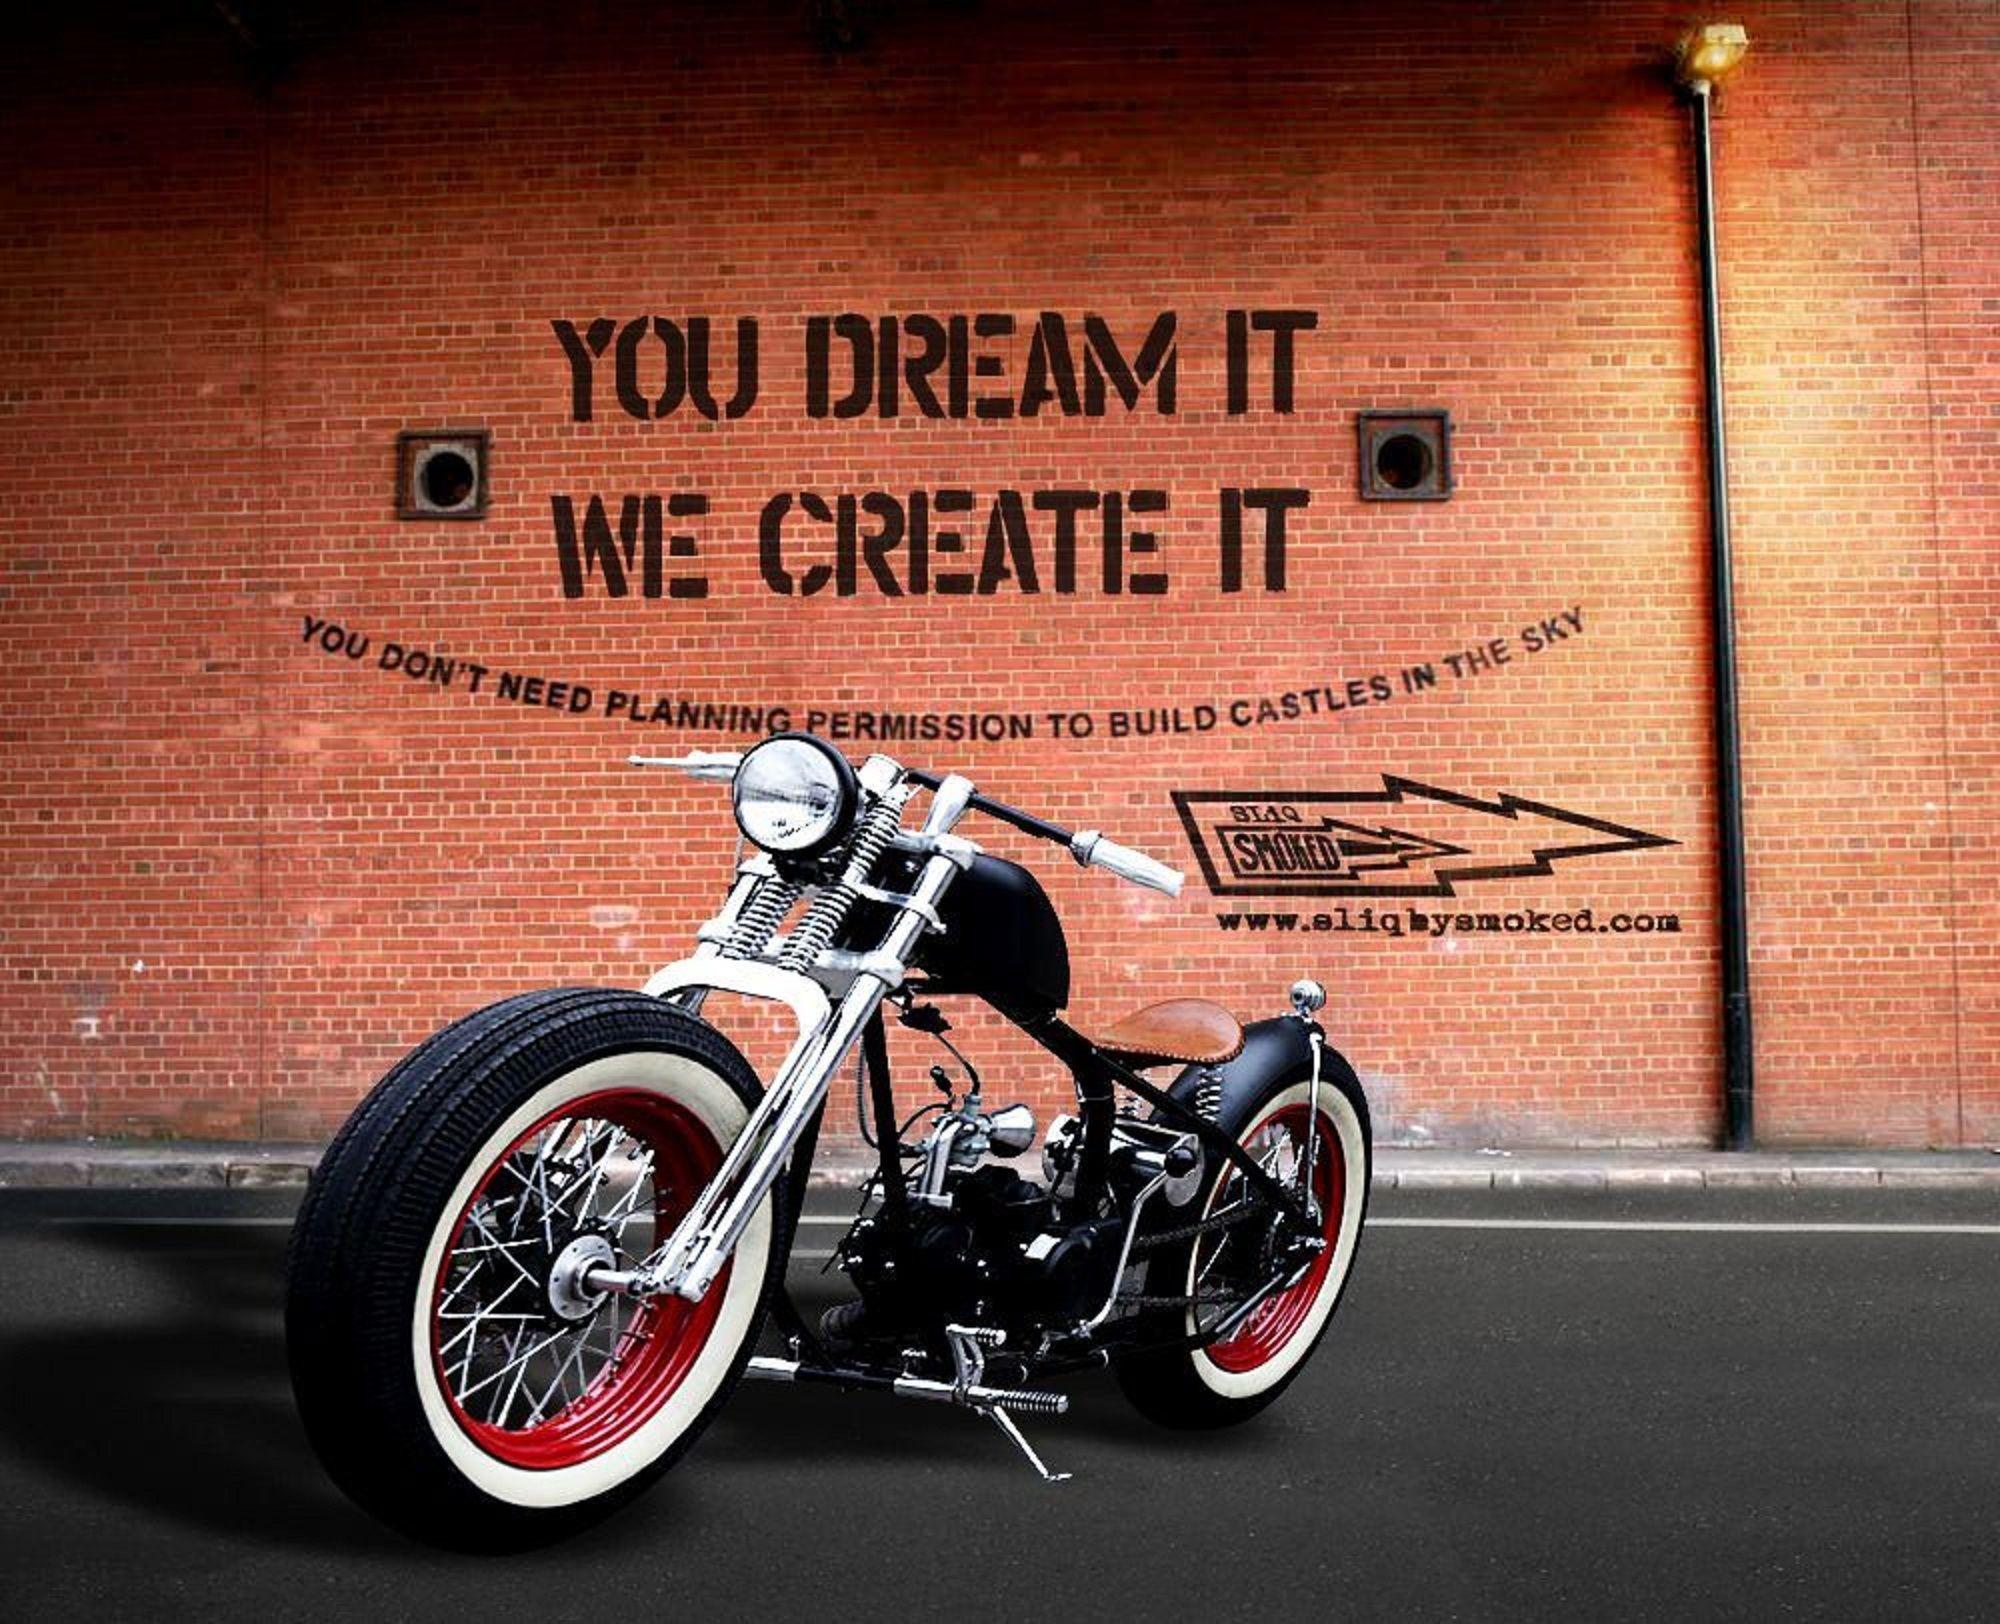 'Sliq By Smoked', 2015 Custom Motorcycle, 125cc, USA Old